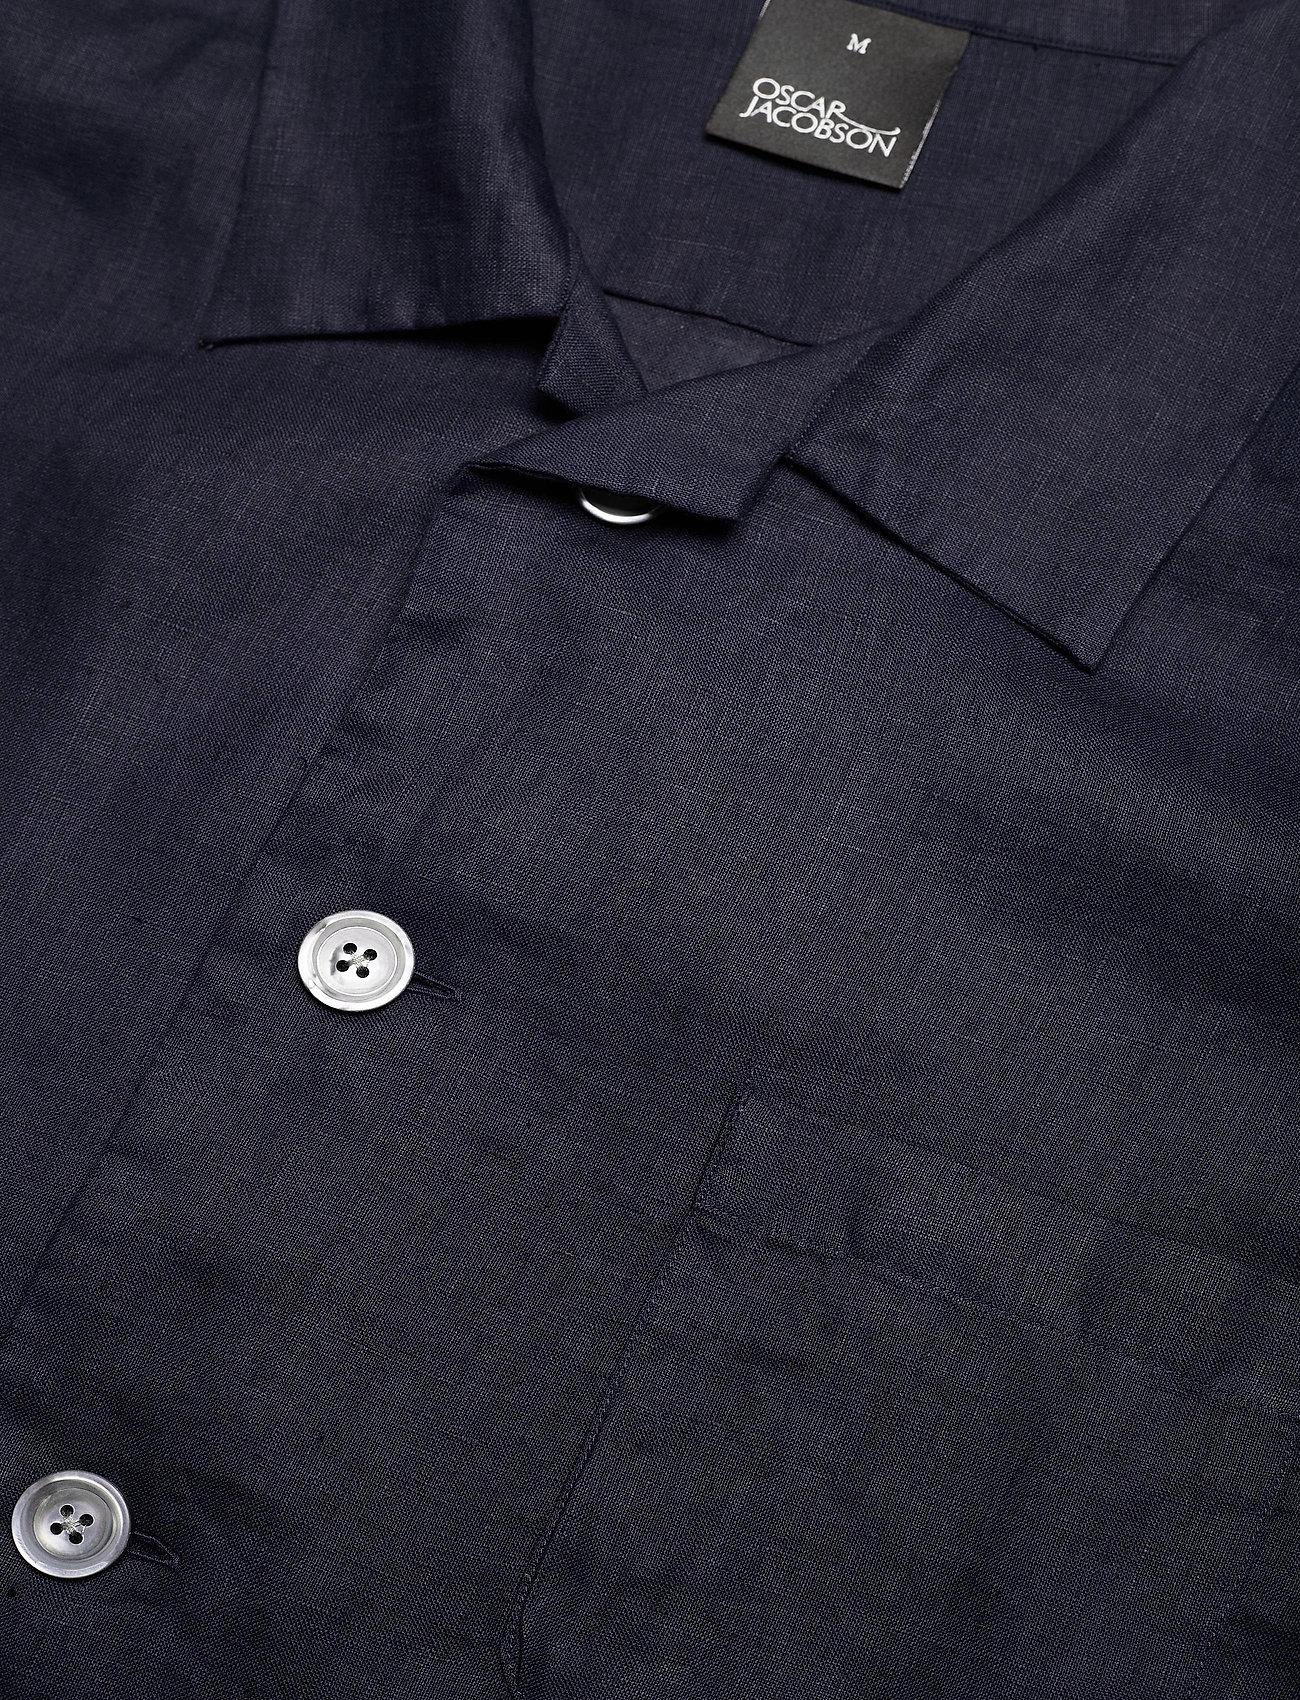 Hanks Reg Shirt Wash (Dark Blue) (84.50 €) - Oscar Jacobson fOLPX